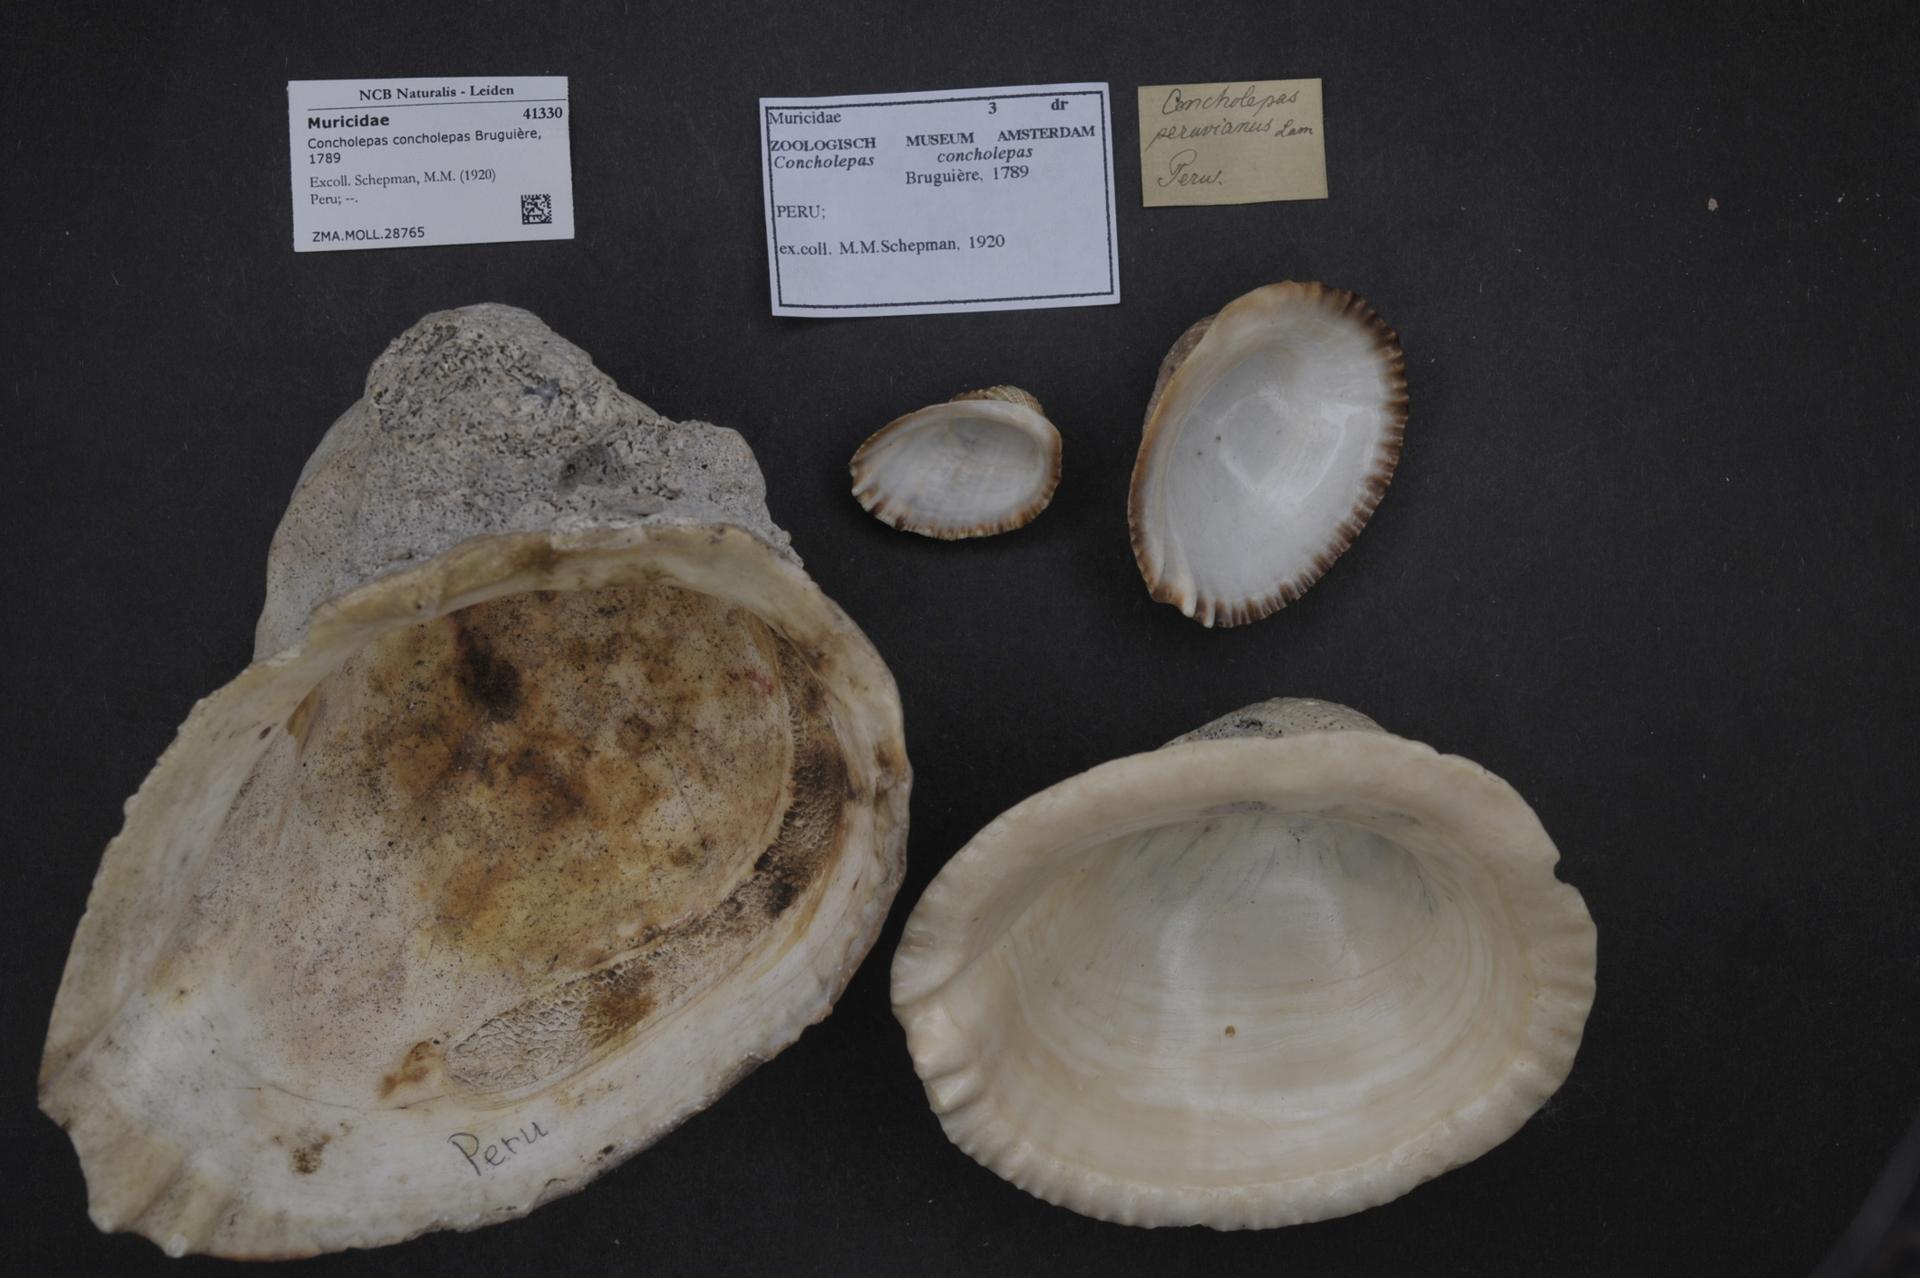 FileNaturalis Biodiversity Center